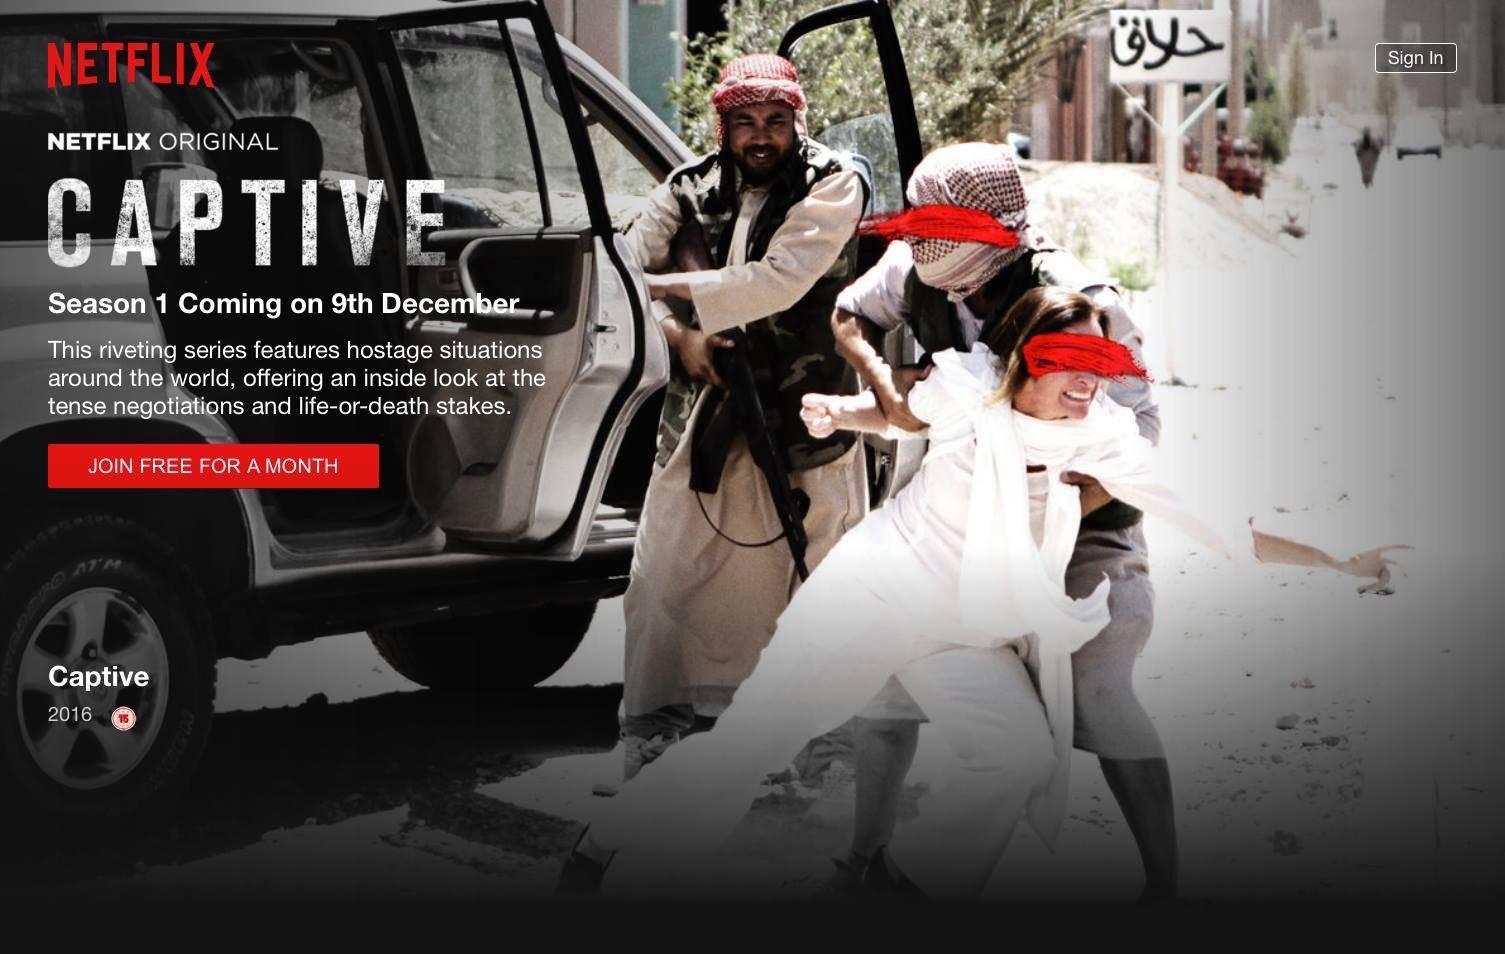 Netflix - Captive